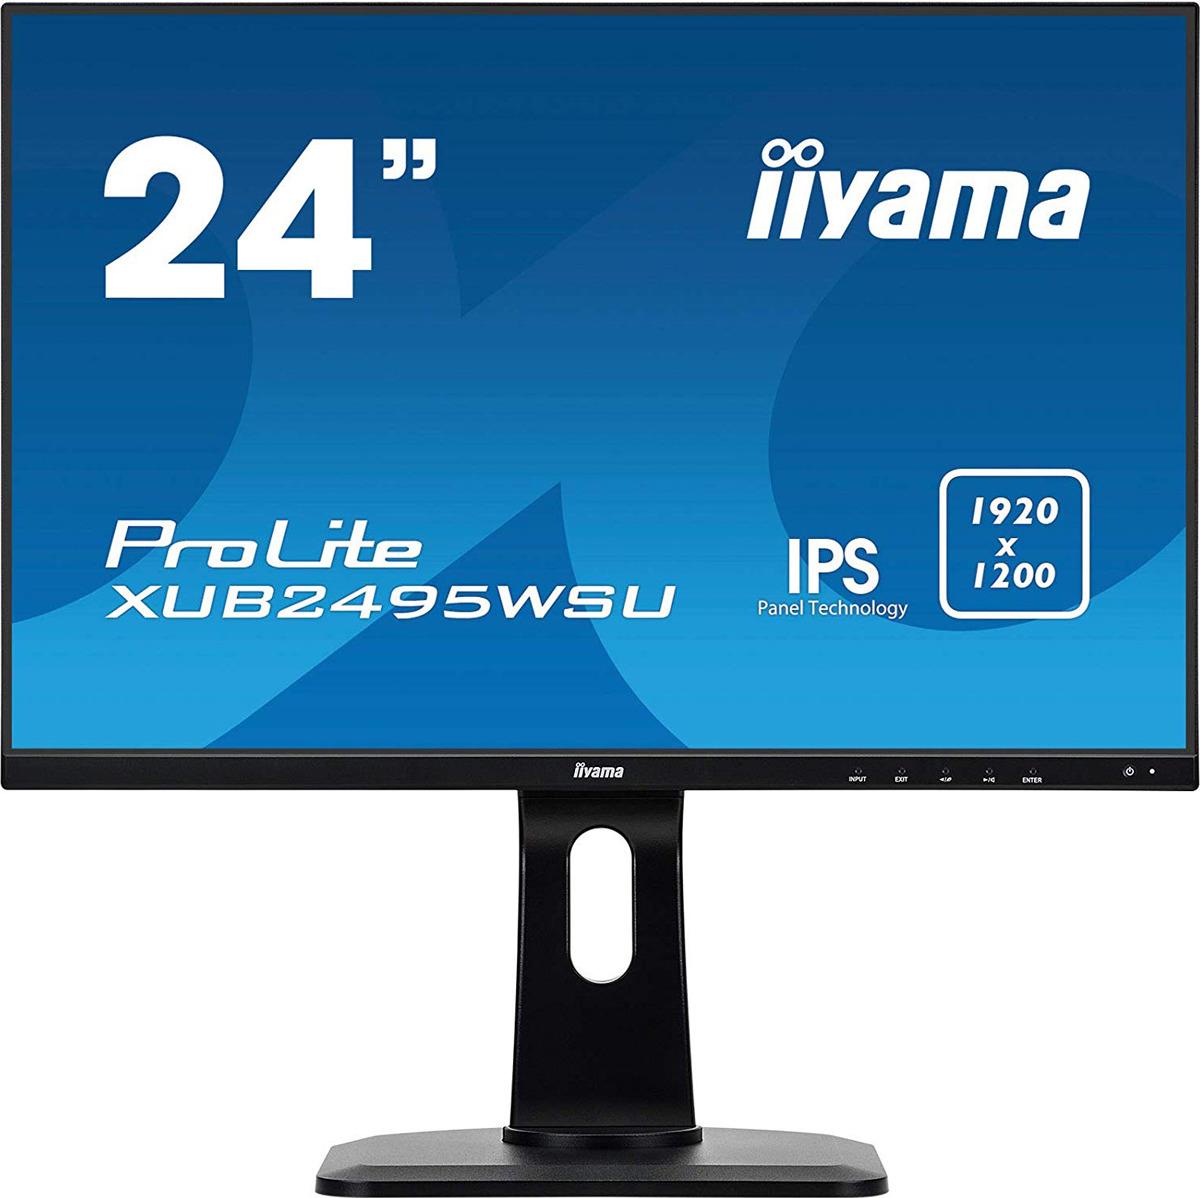 Монитор Iiyama 24.1 ProLite XUB2495WSU-B1, черный монитор iiyama xub2495wsu b1